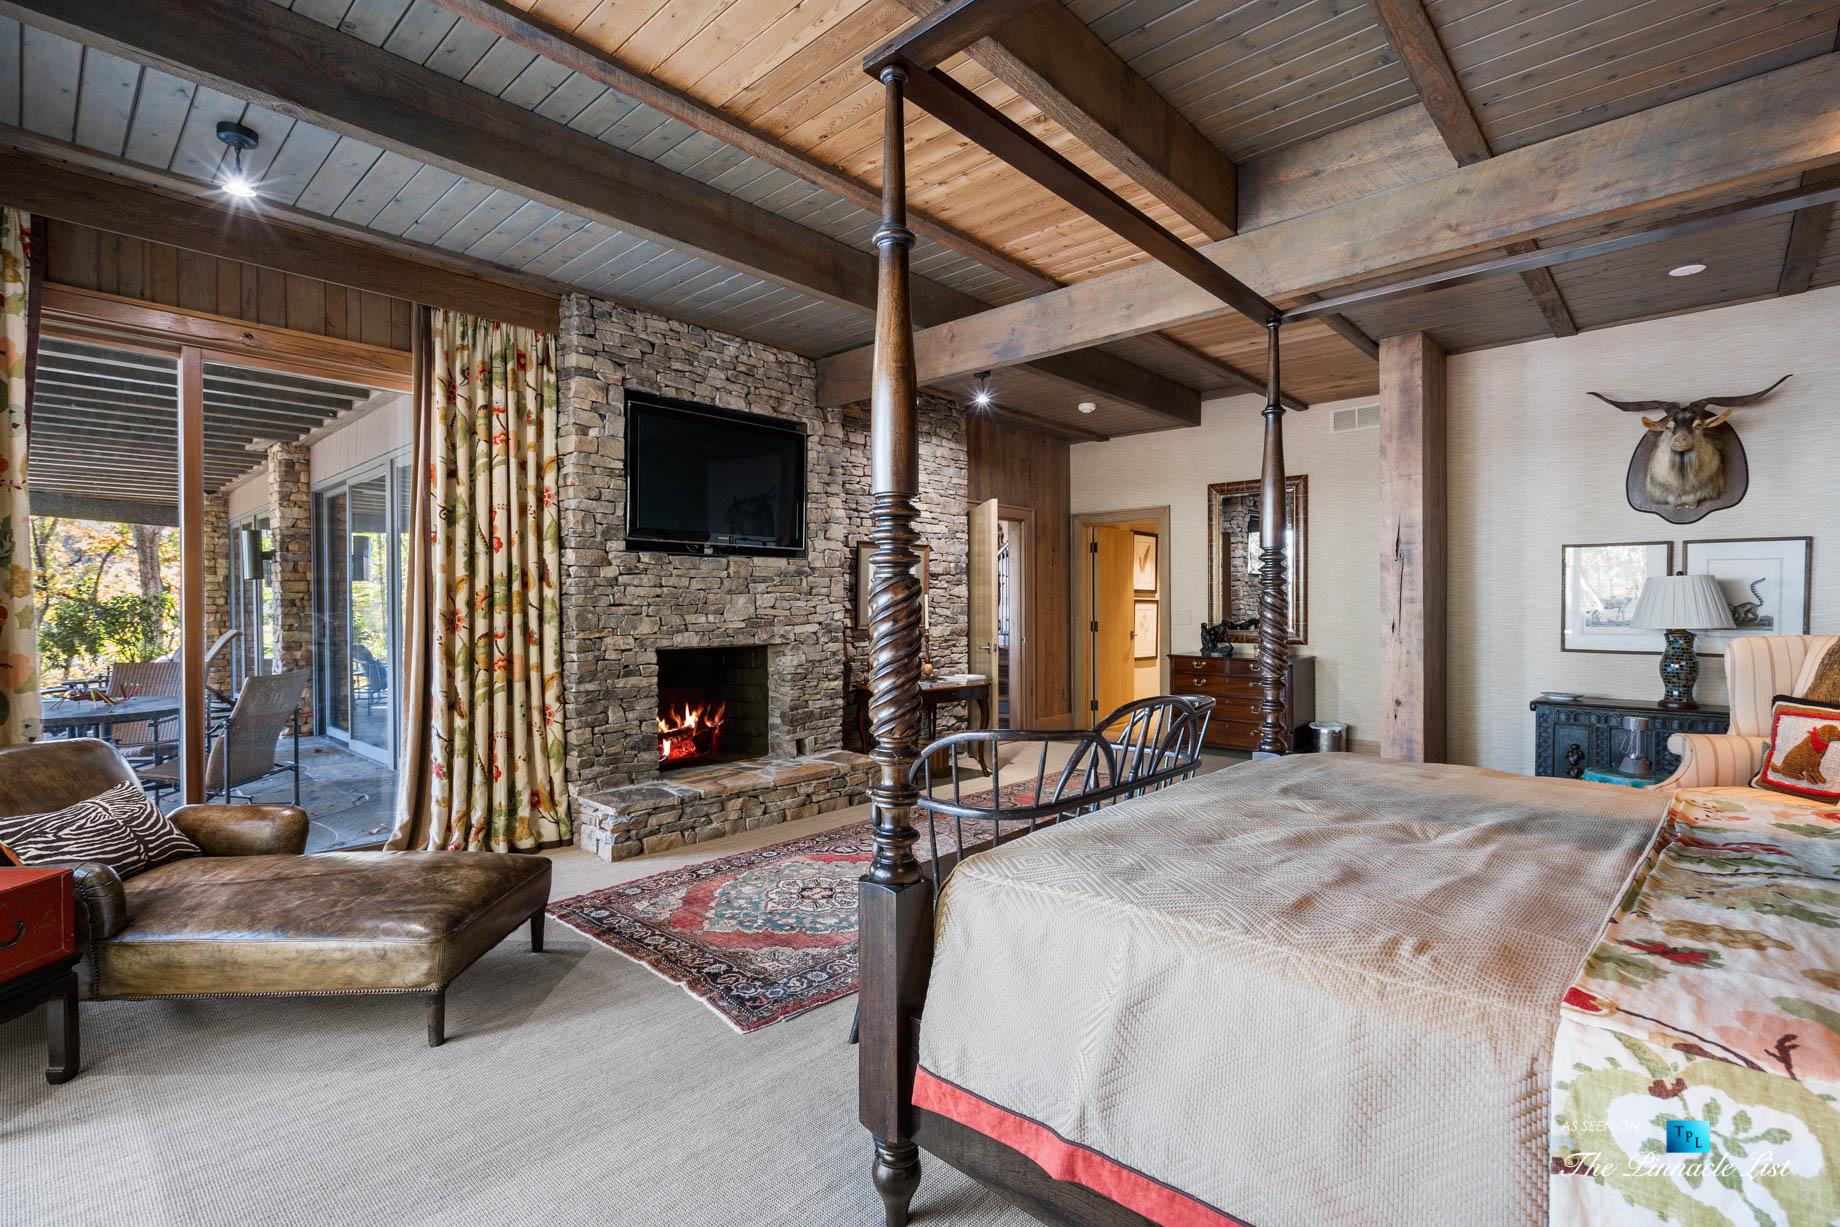 7860 Chestnut Hill Rd, Cumming, GA, USA – Bedroom – Luxury Real Estate – Lake Lanier Mid-Century Modern Stone Home